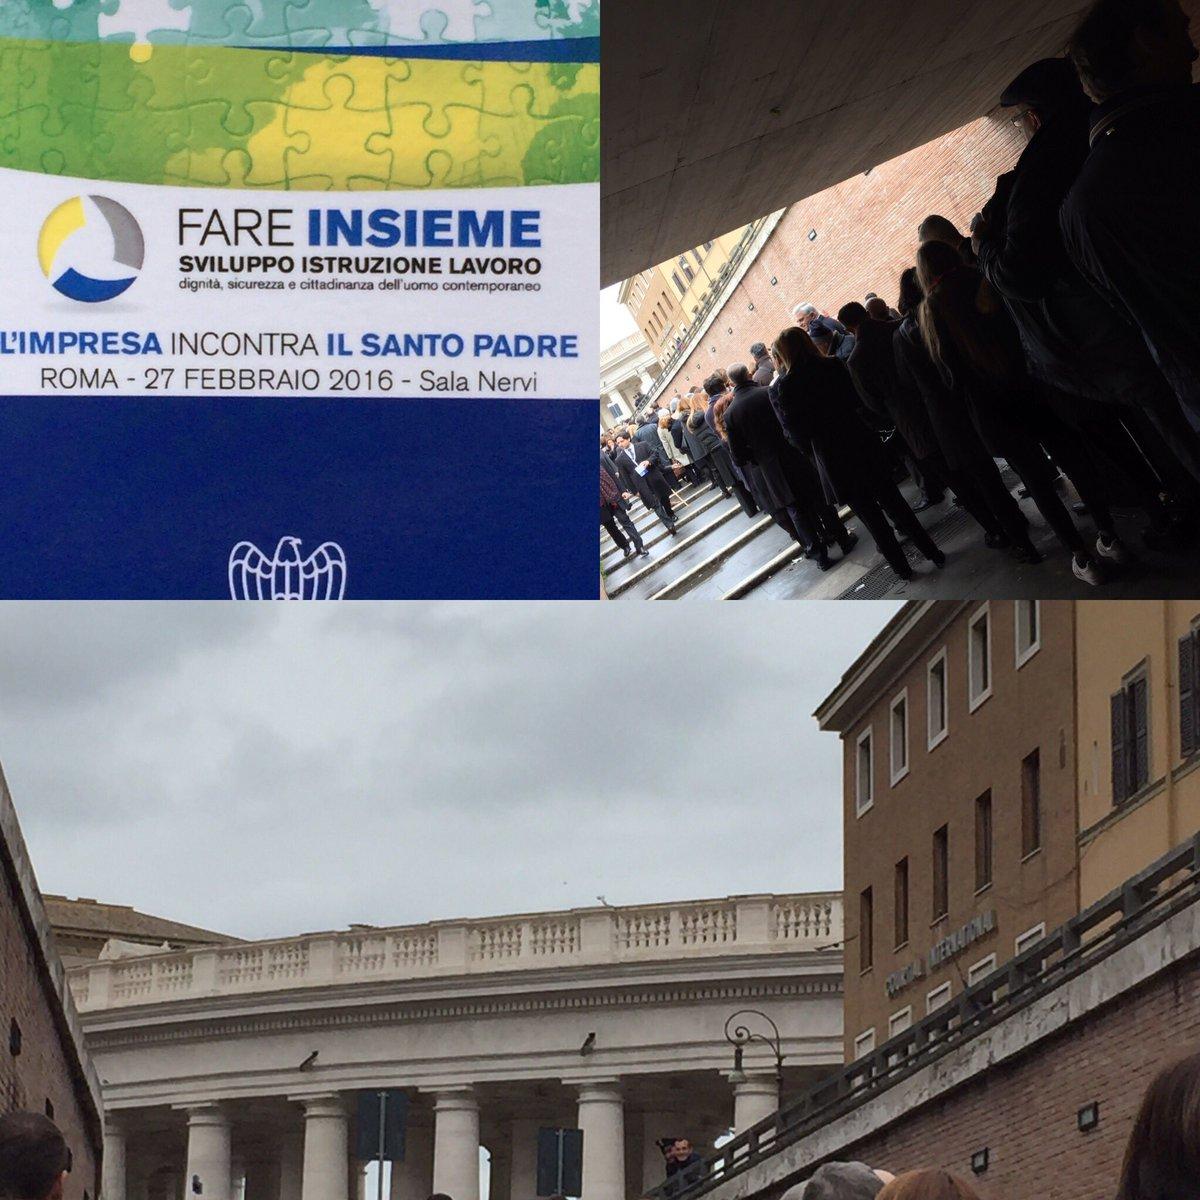 #GiubileoIndustria 7000 imprenditori per #fareinsieme #fareimpresa #Confindustria incontrano Papa Francesco https://t.co/LnWilfEpXt